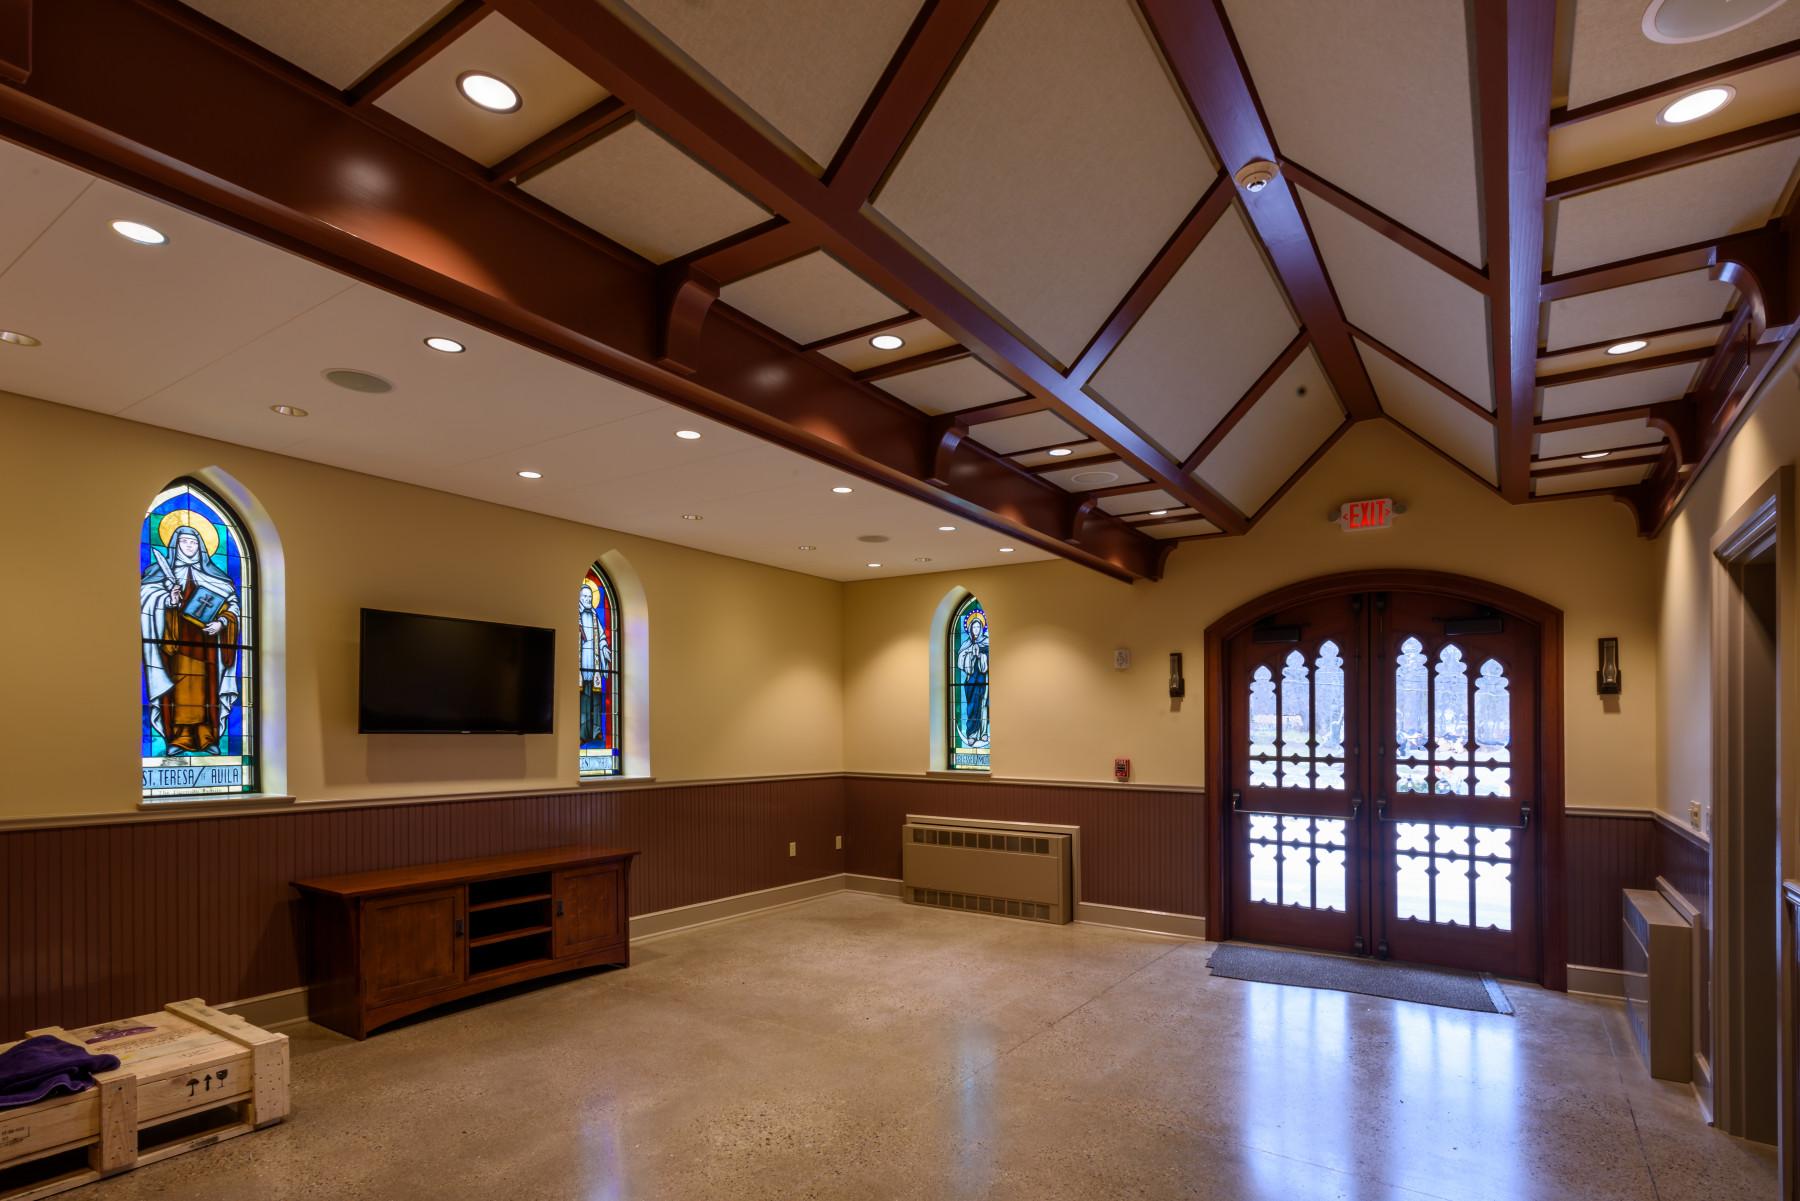 St. Vincent's Madison NJ indoor